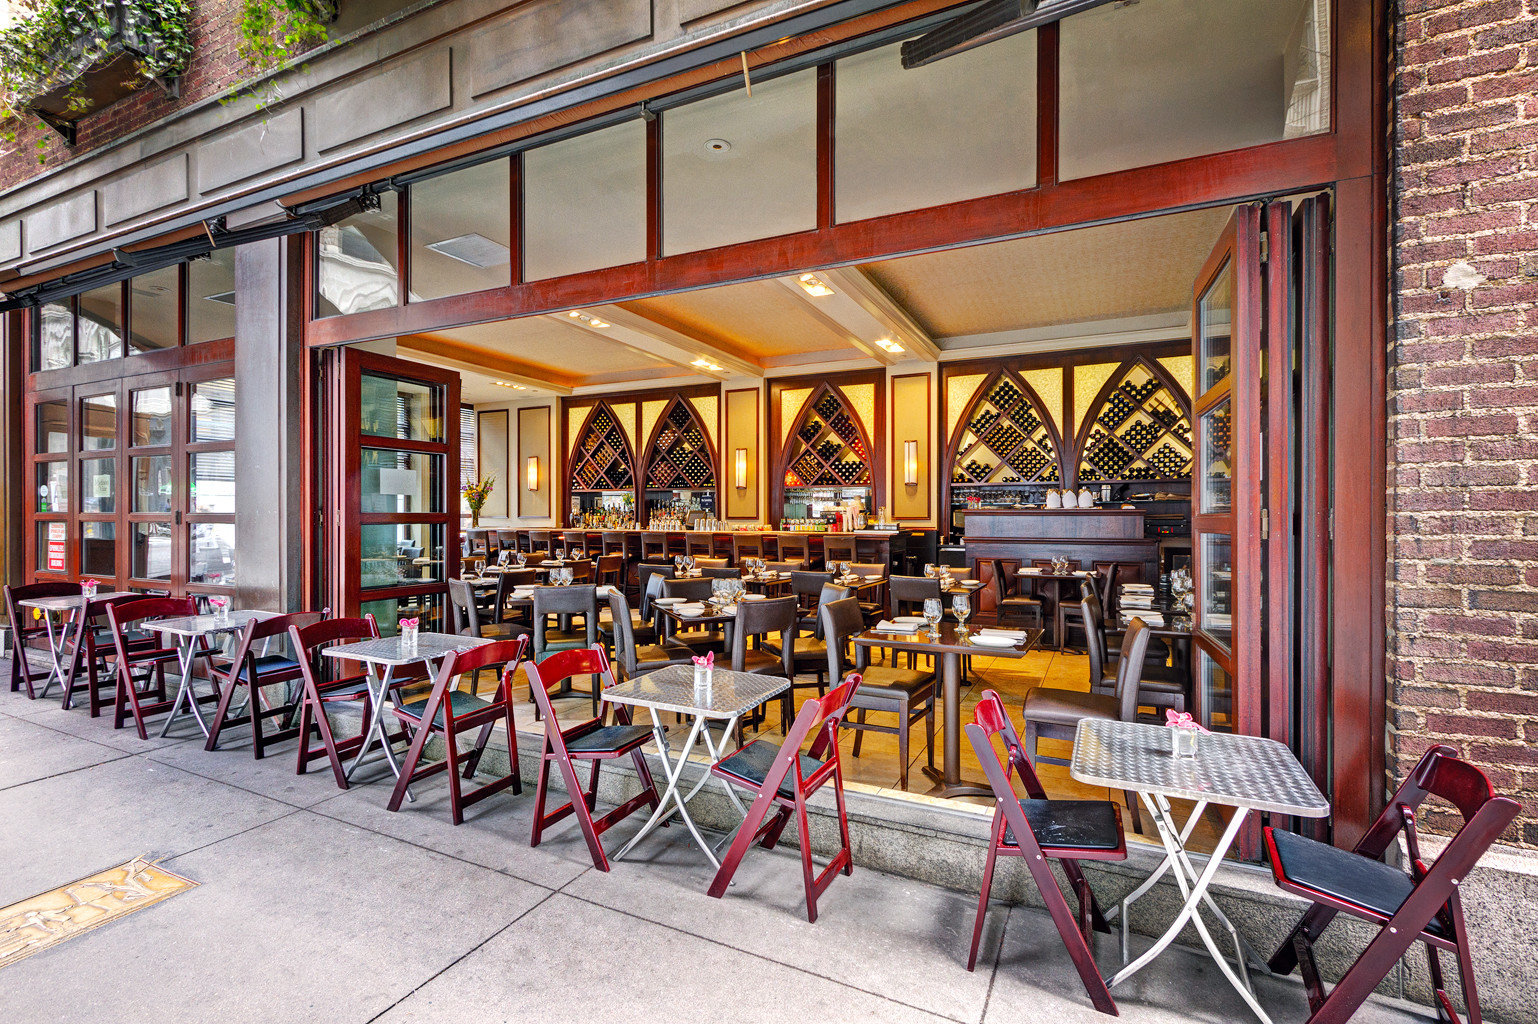 Boutique Business City Dining Drink Eat Modern building chair restaurant Bar